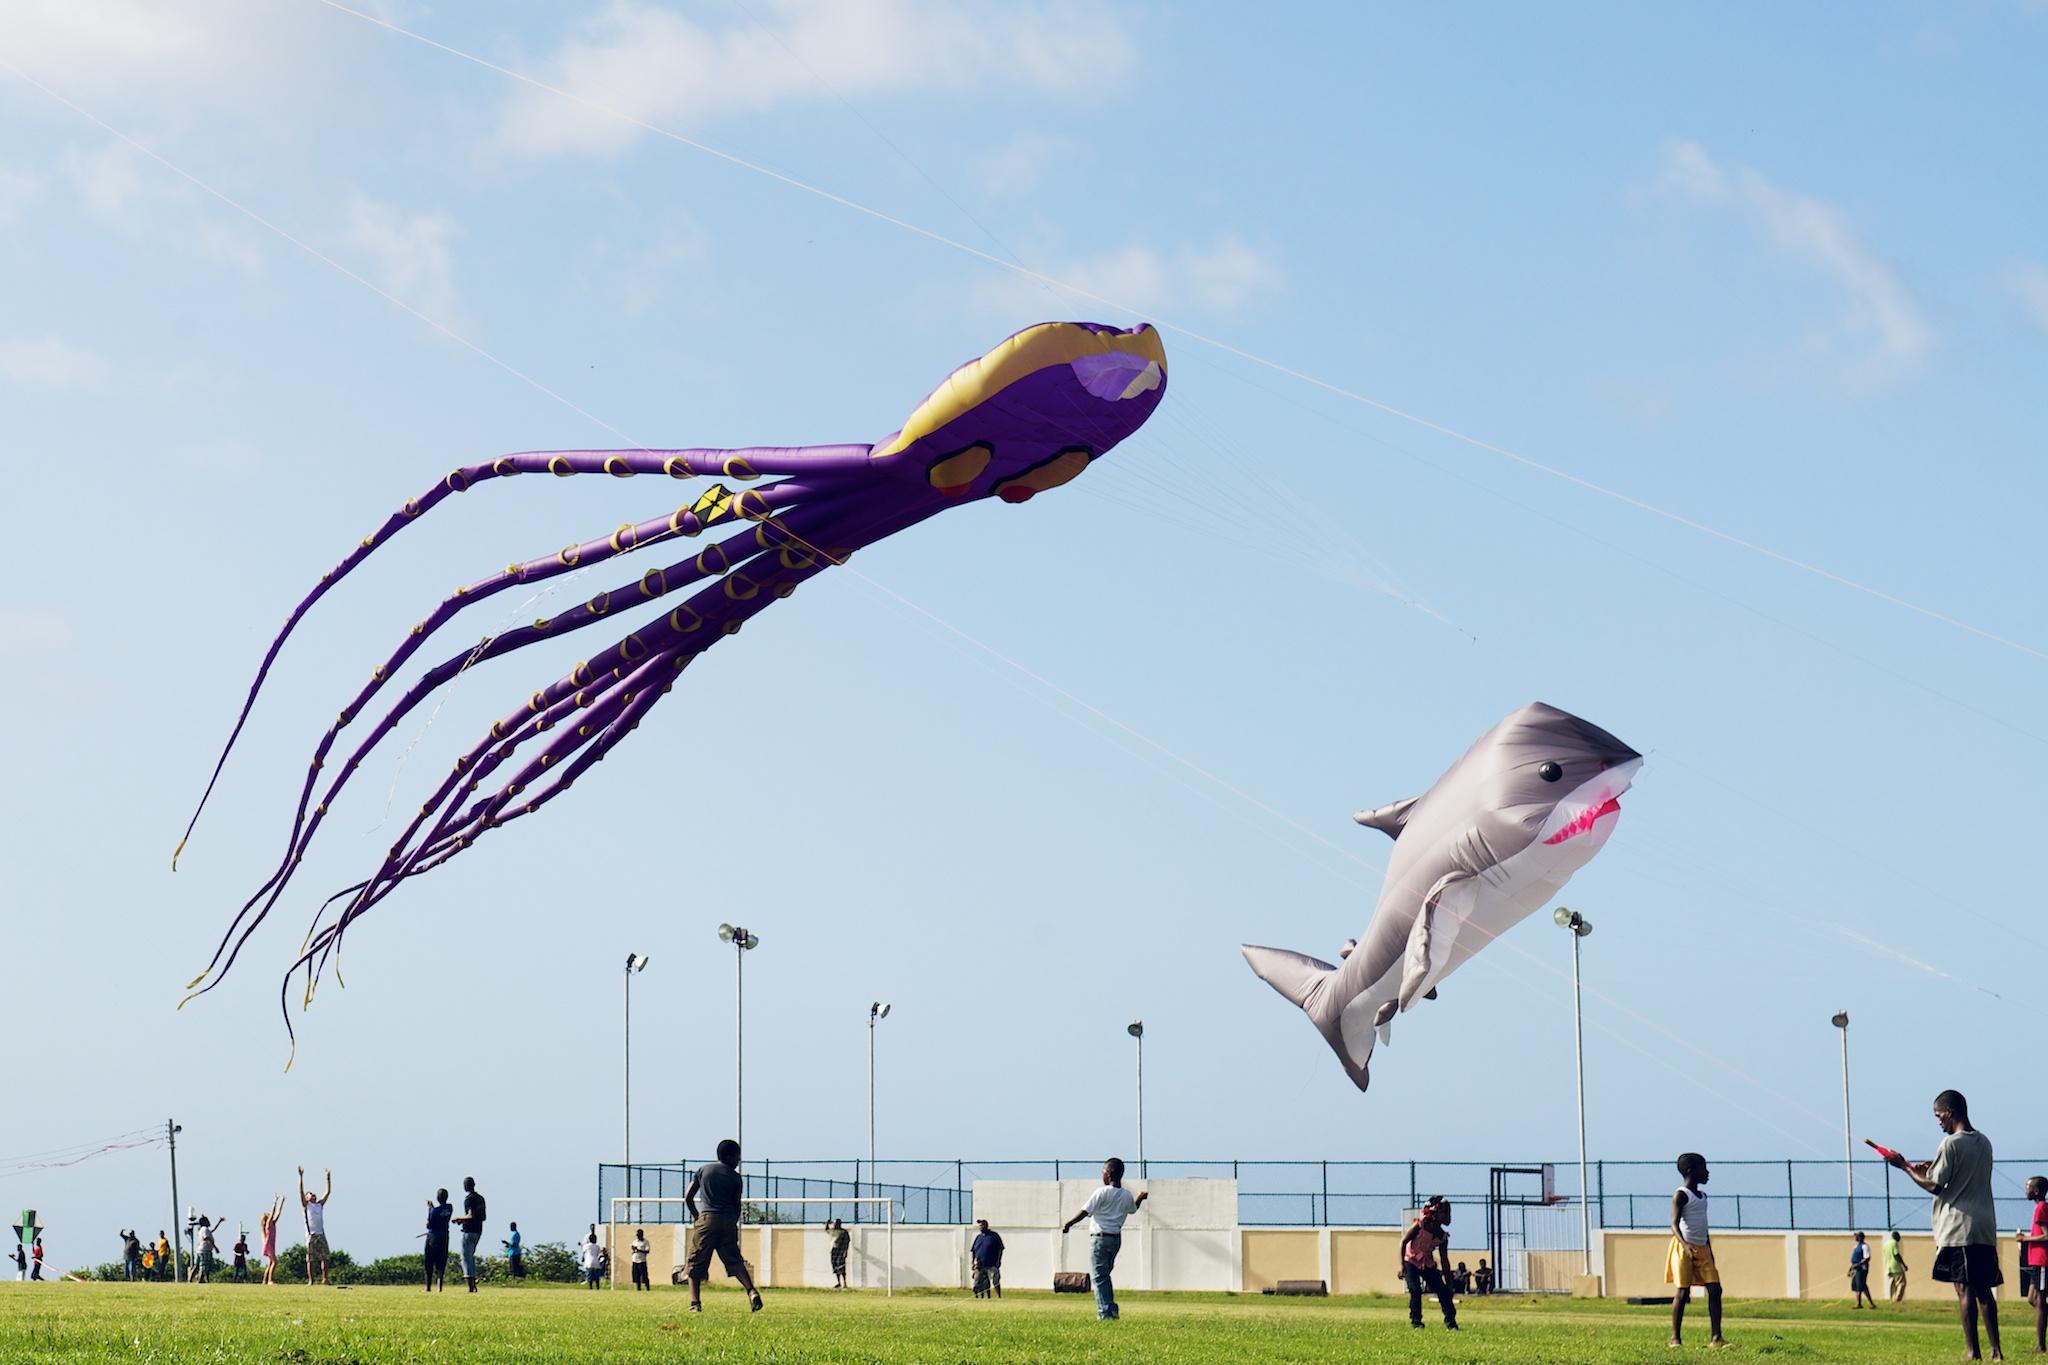 Tobago Flying Colours Kite Festival